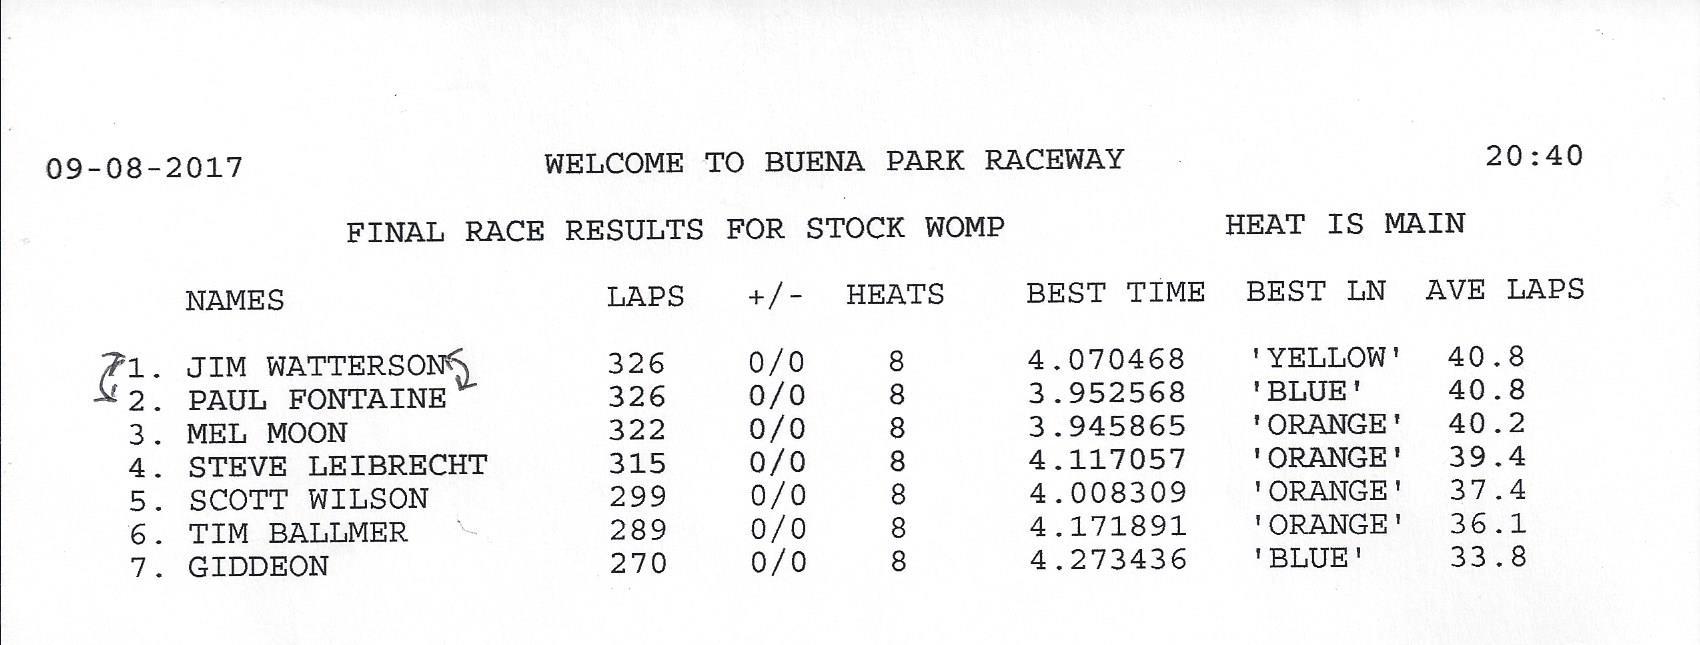 9817 womp results  new.jpeg